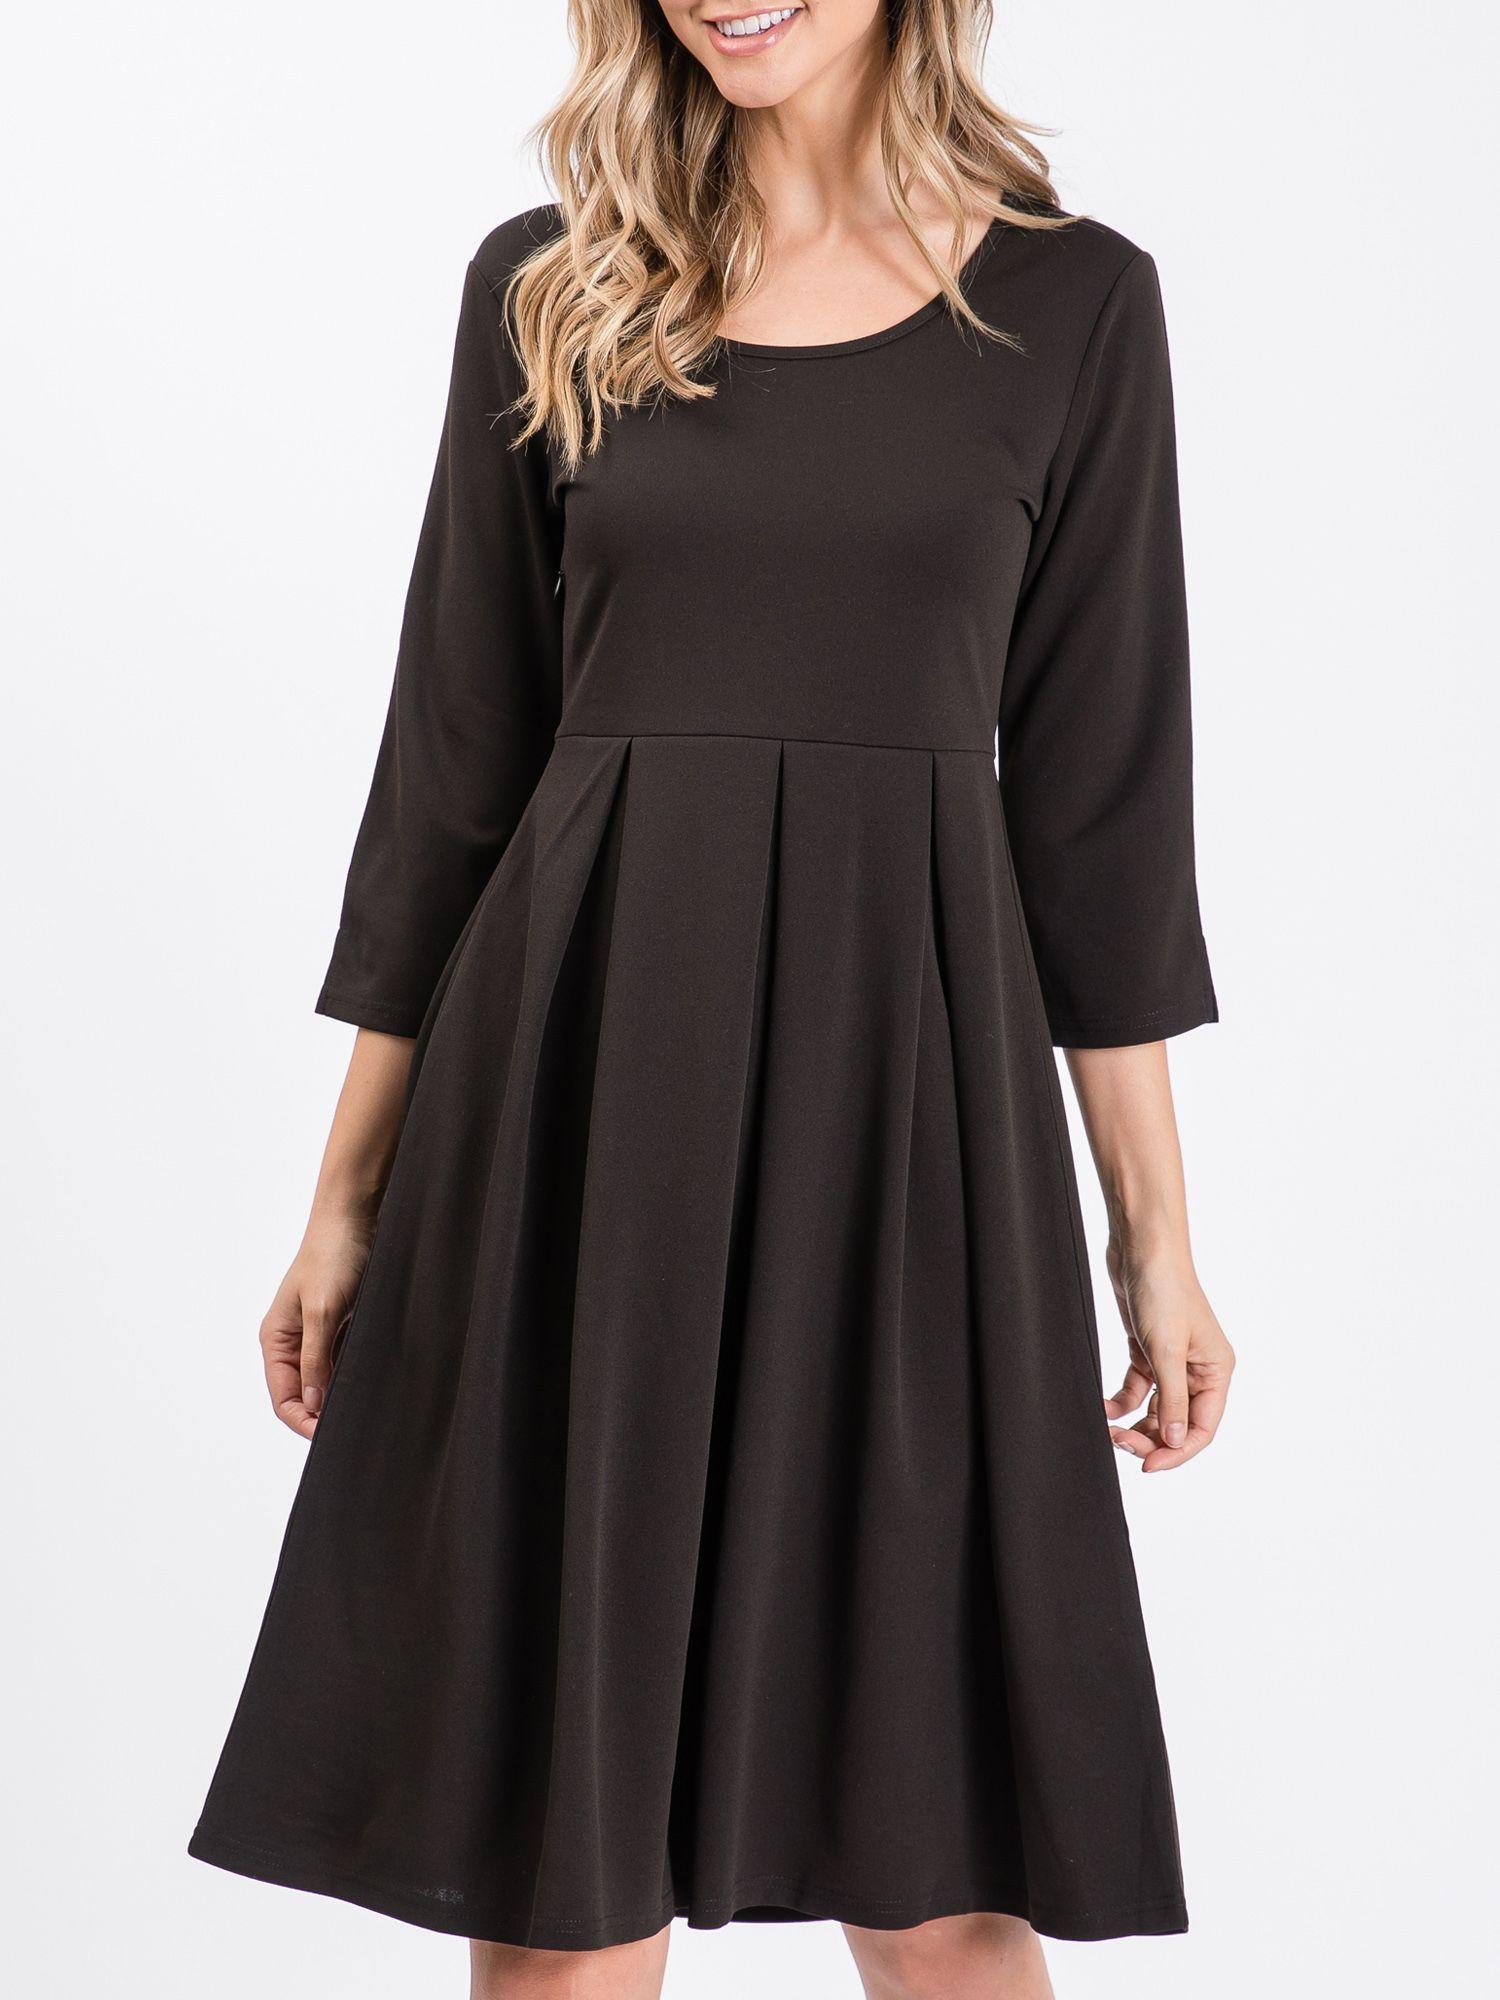 Doublju Doublju Women S 3 4 Sleeve Pleated Dress Plus Size Available Walmart Com Pleated Dress Dresses Women [ 2000 x 1500 Pixel ]